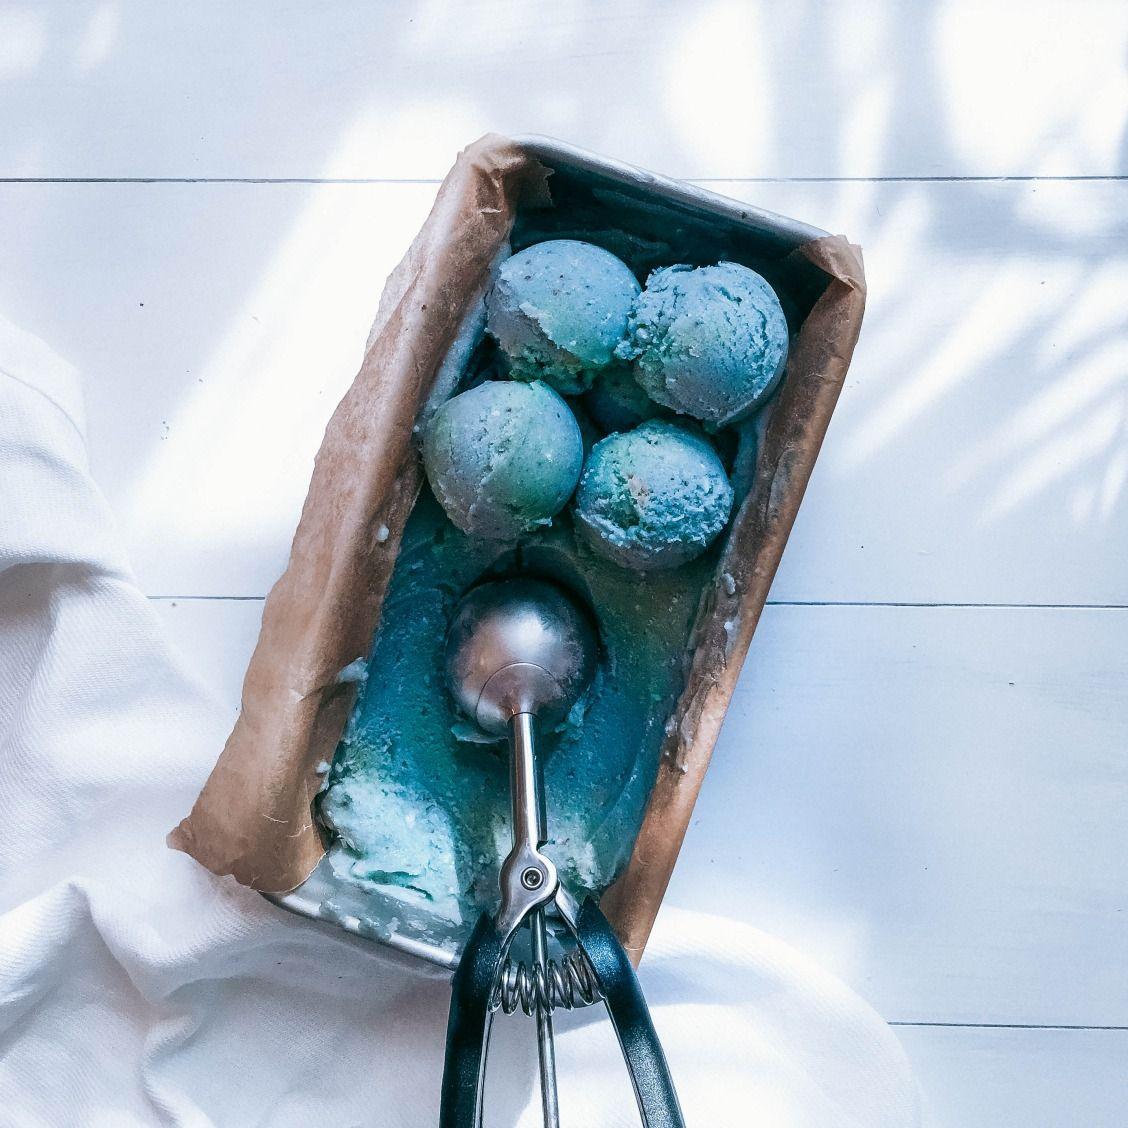 Vegan Mermaid Nicecream recipe with spirulina and blue algae!